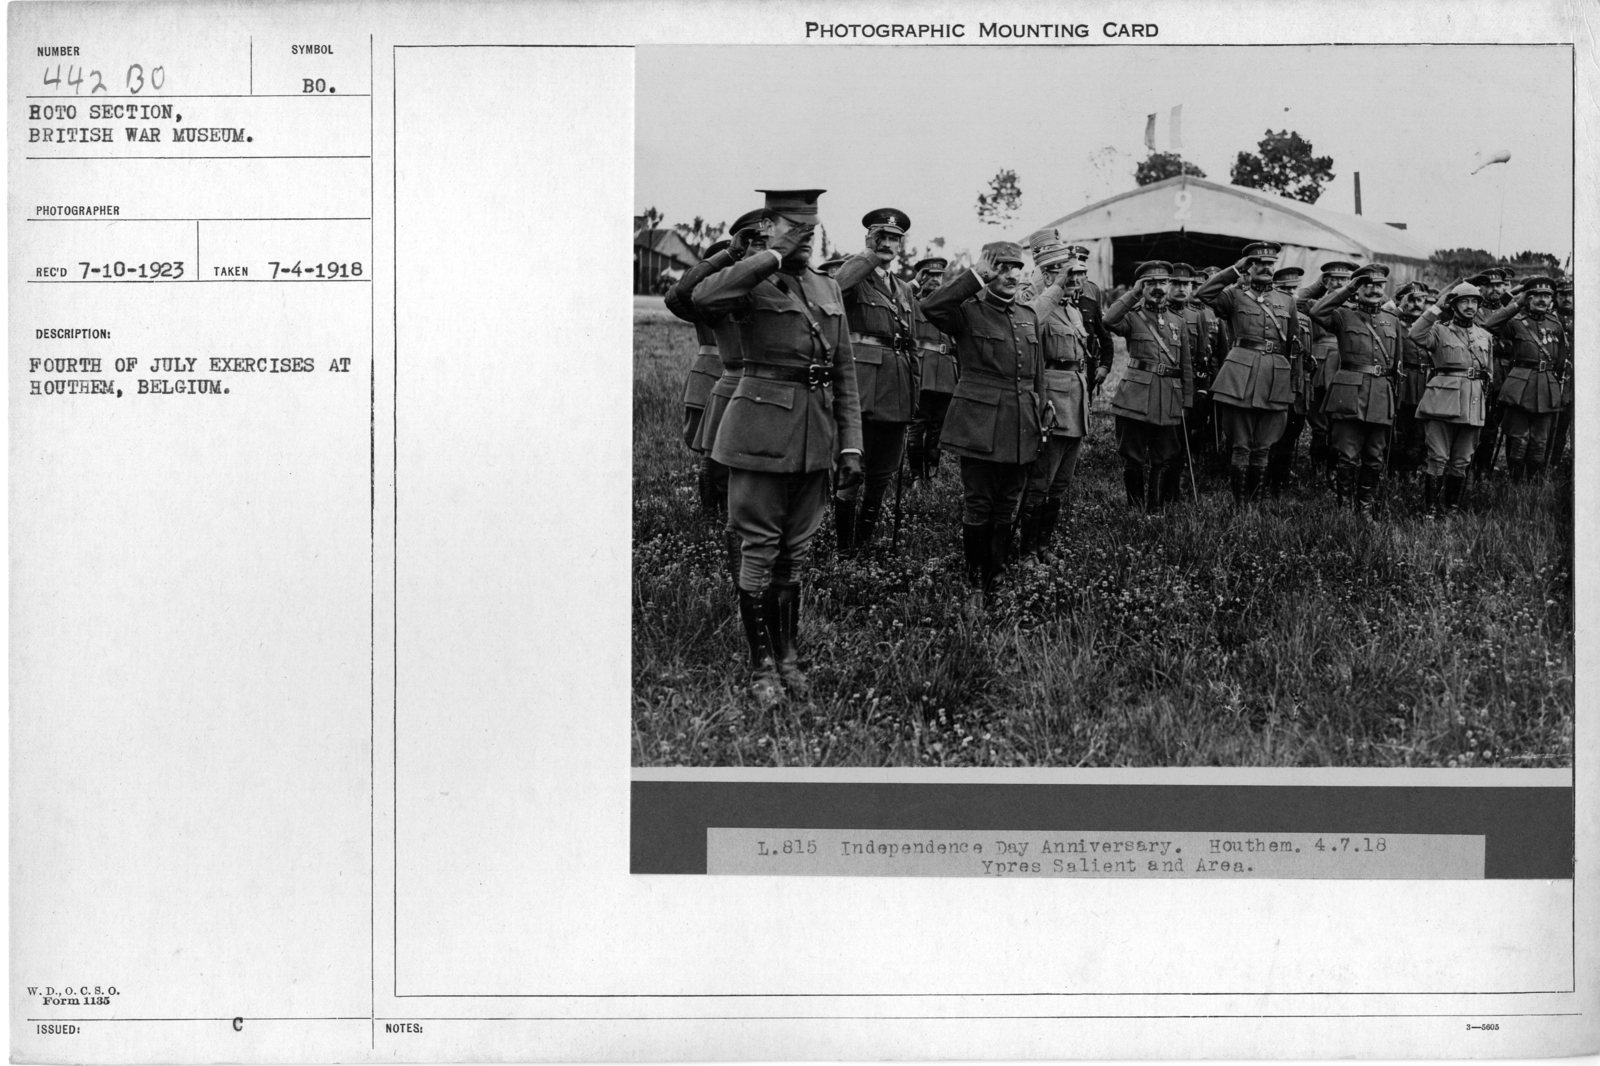 Fourth of July exercises at Houthem, Belgium; 7/4/1918